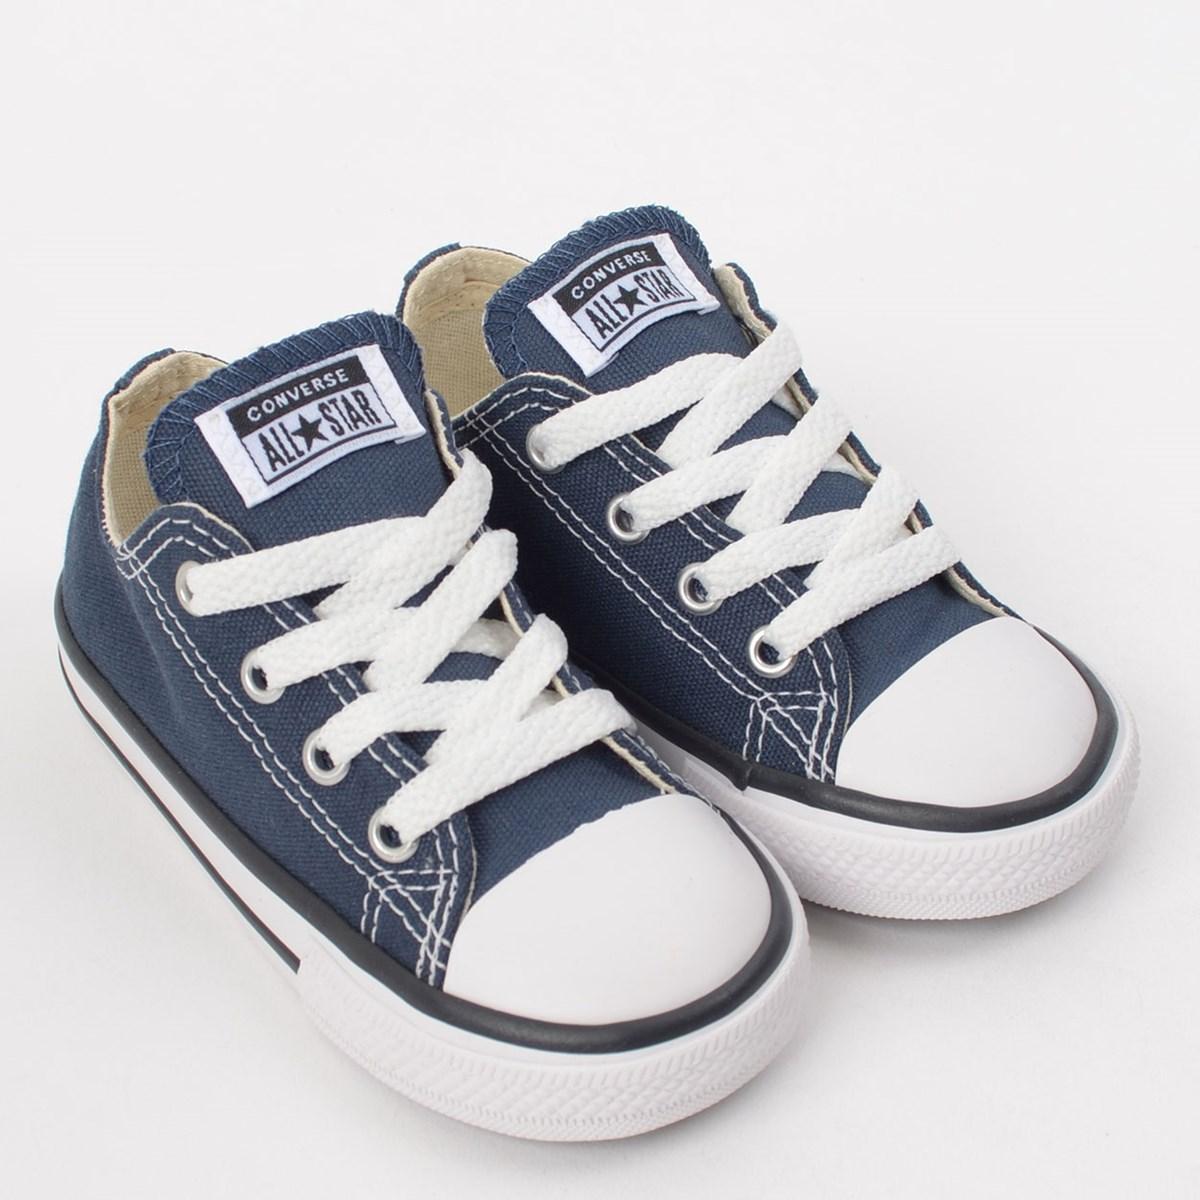 Tênis Converse Chuck Taylor All Star Kids Ox Marinho CK00010003